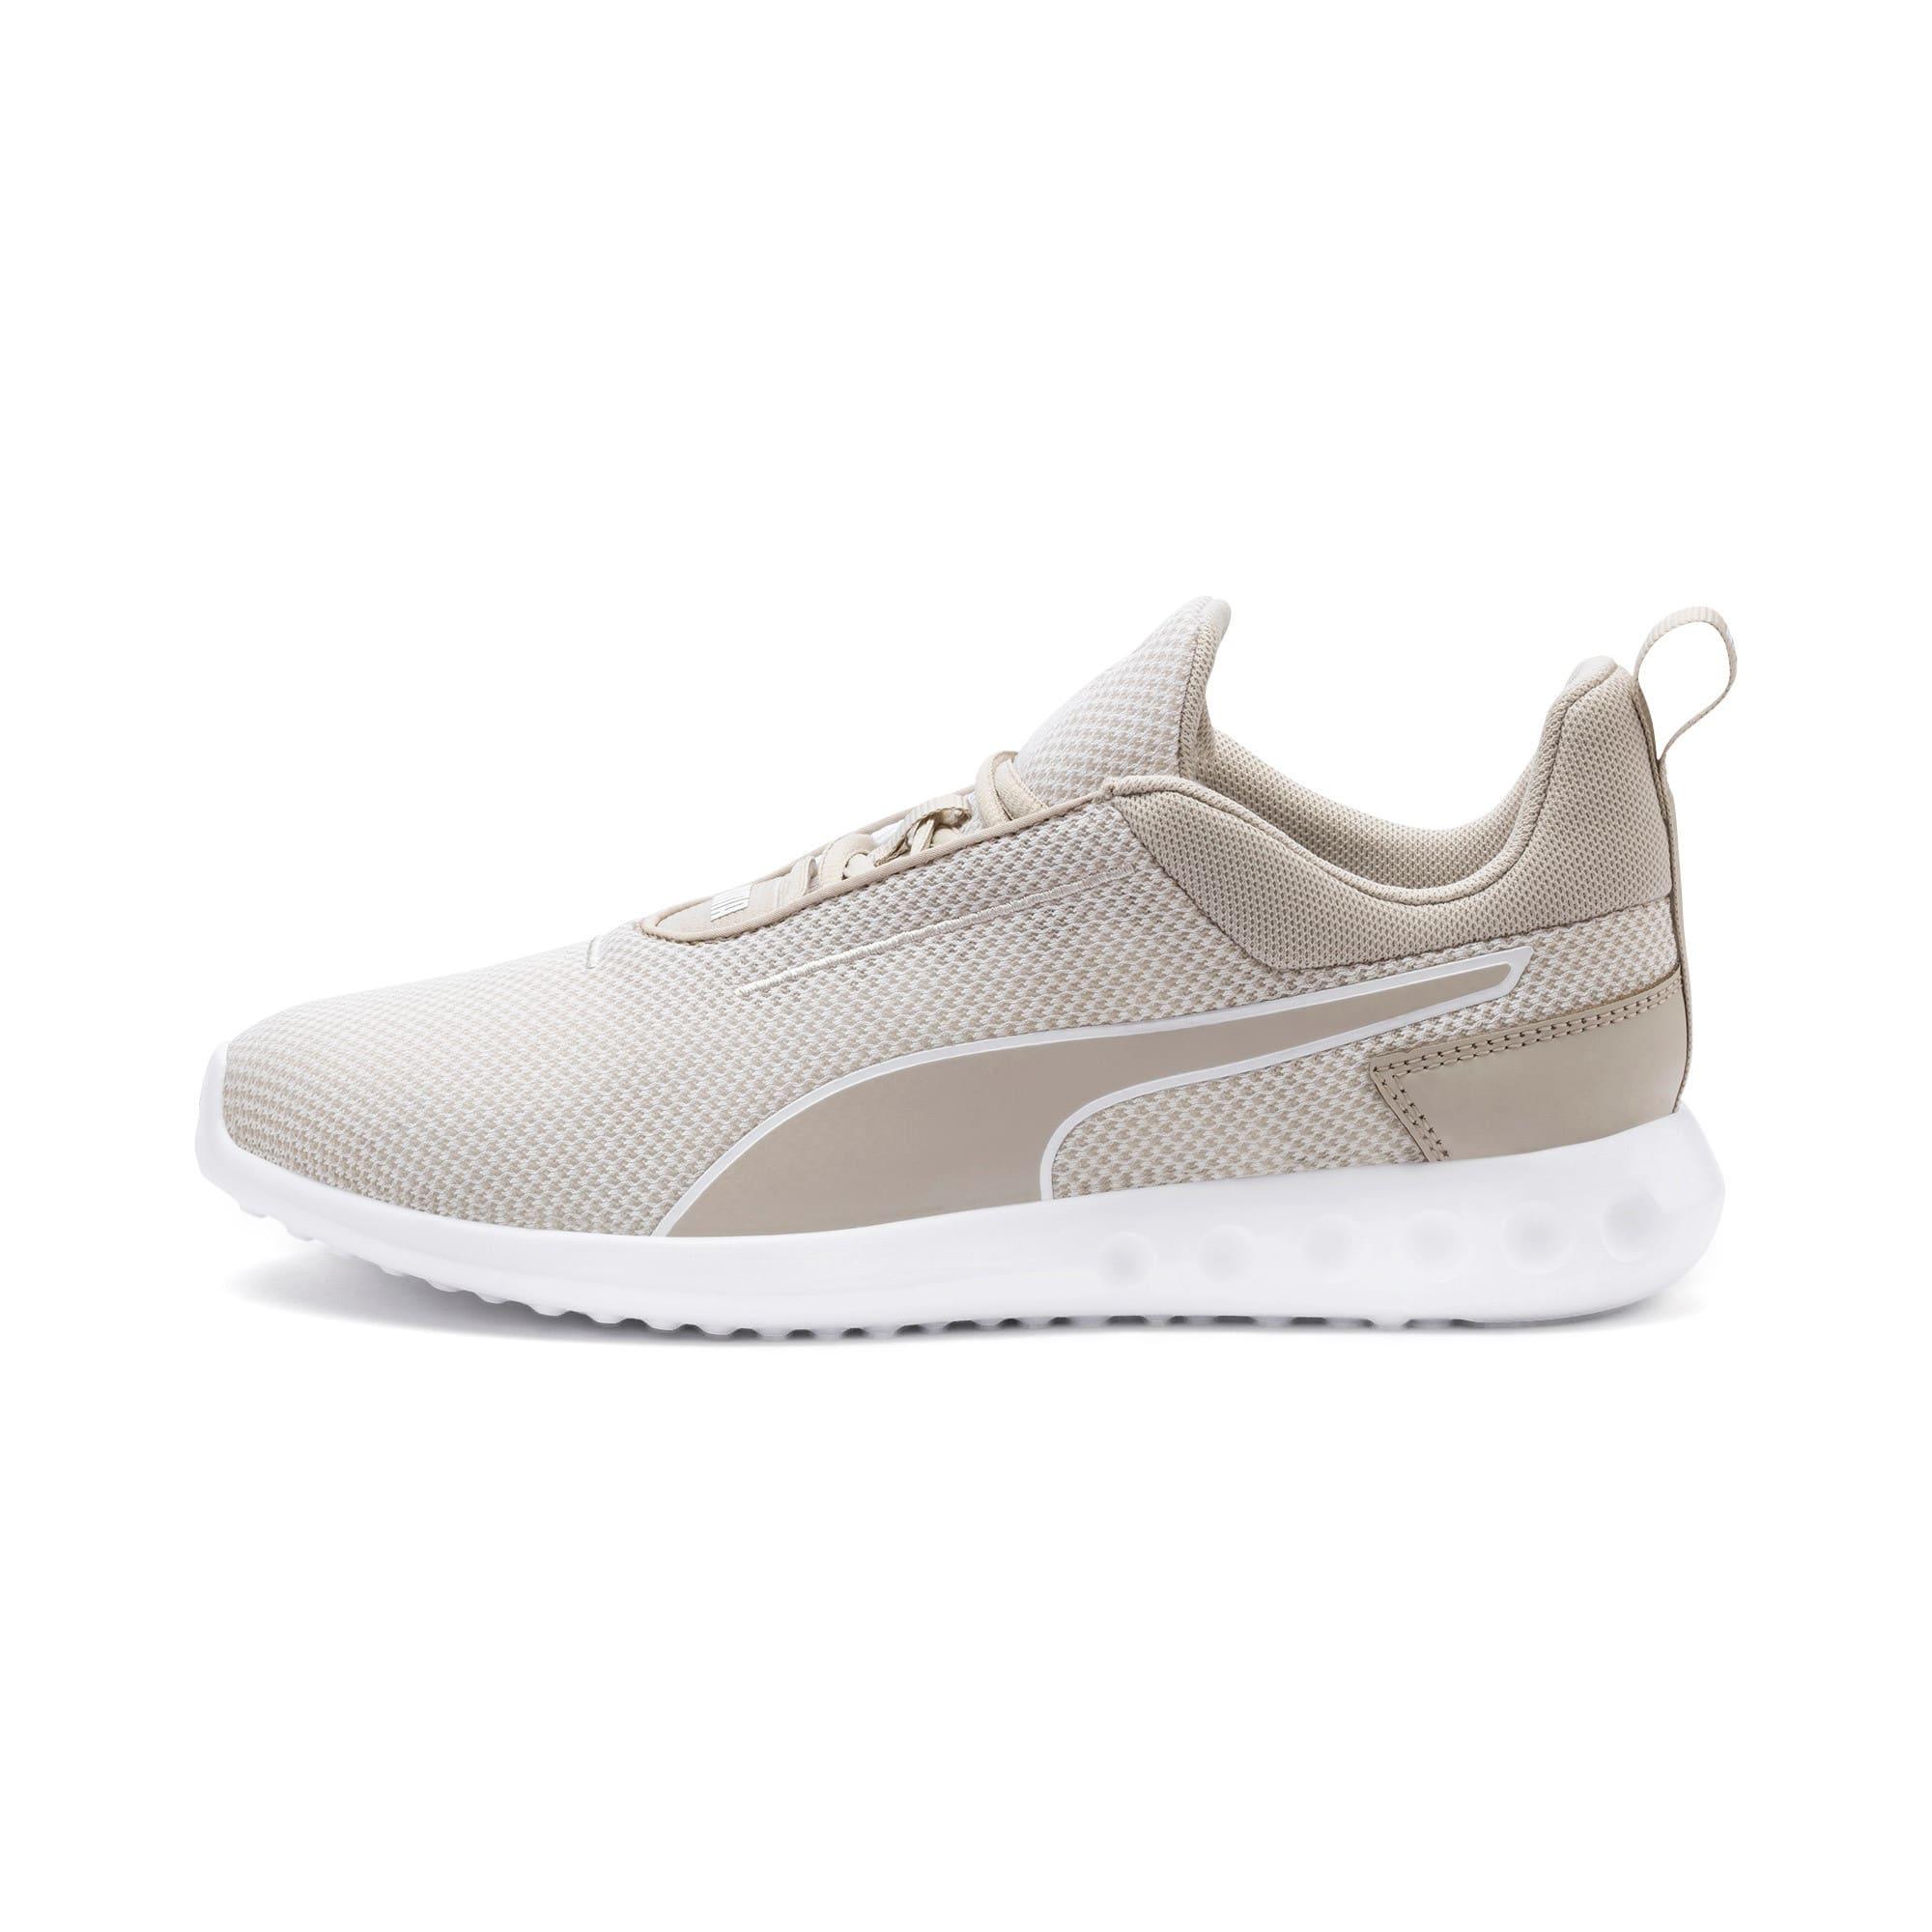 Thumbnail 1 of Carson 2 Concave Women's Training Shoes, Silver Gray-Puma White, medium